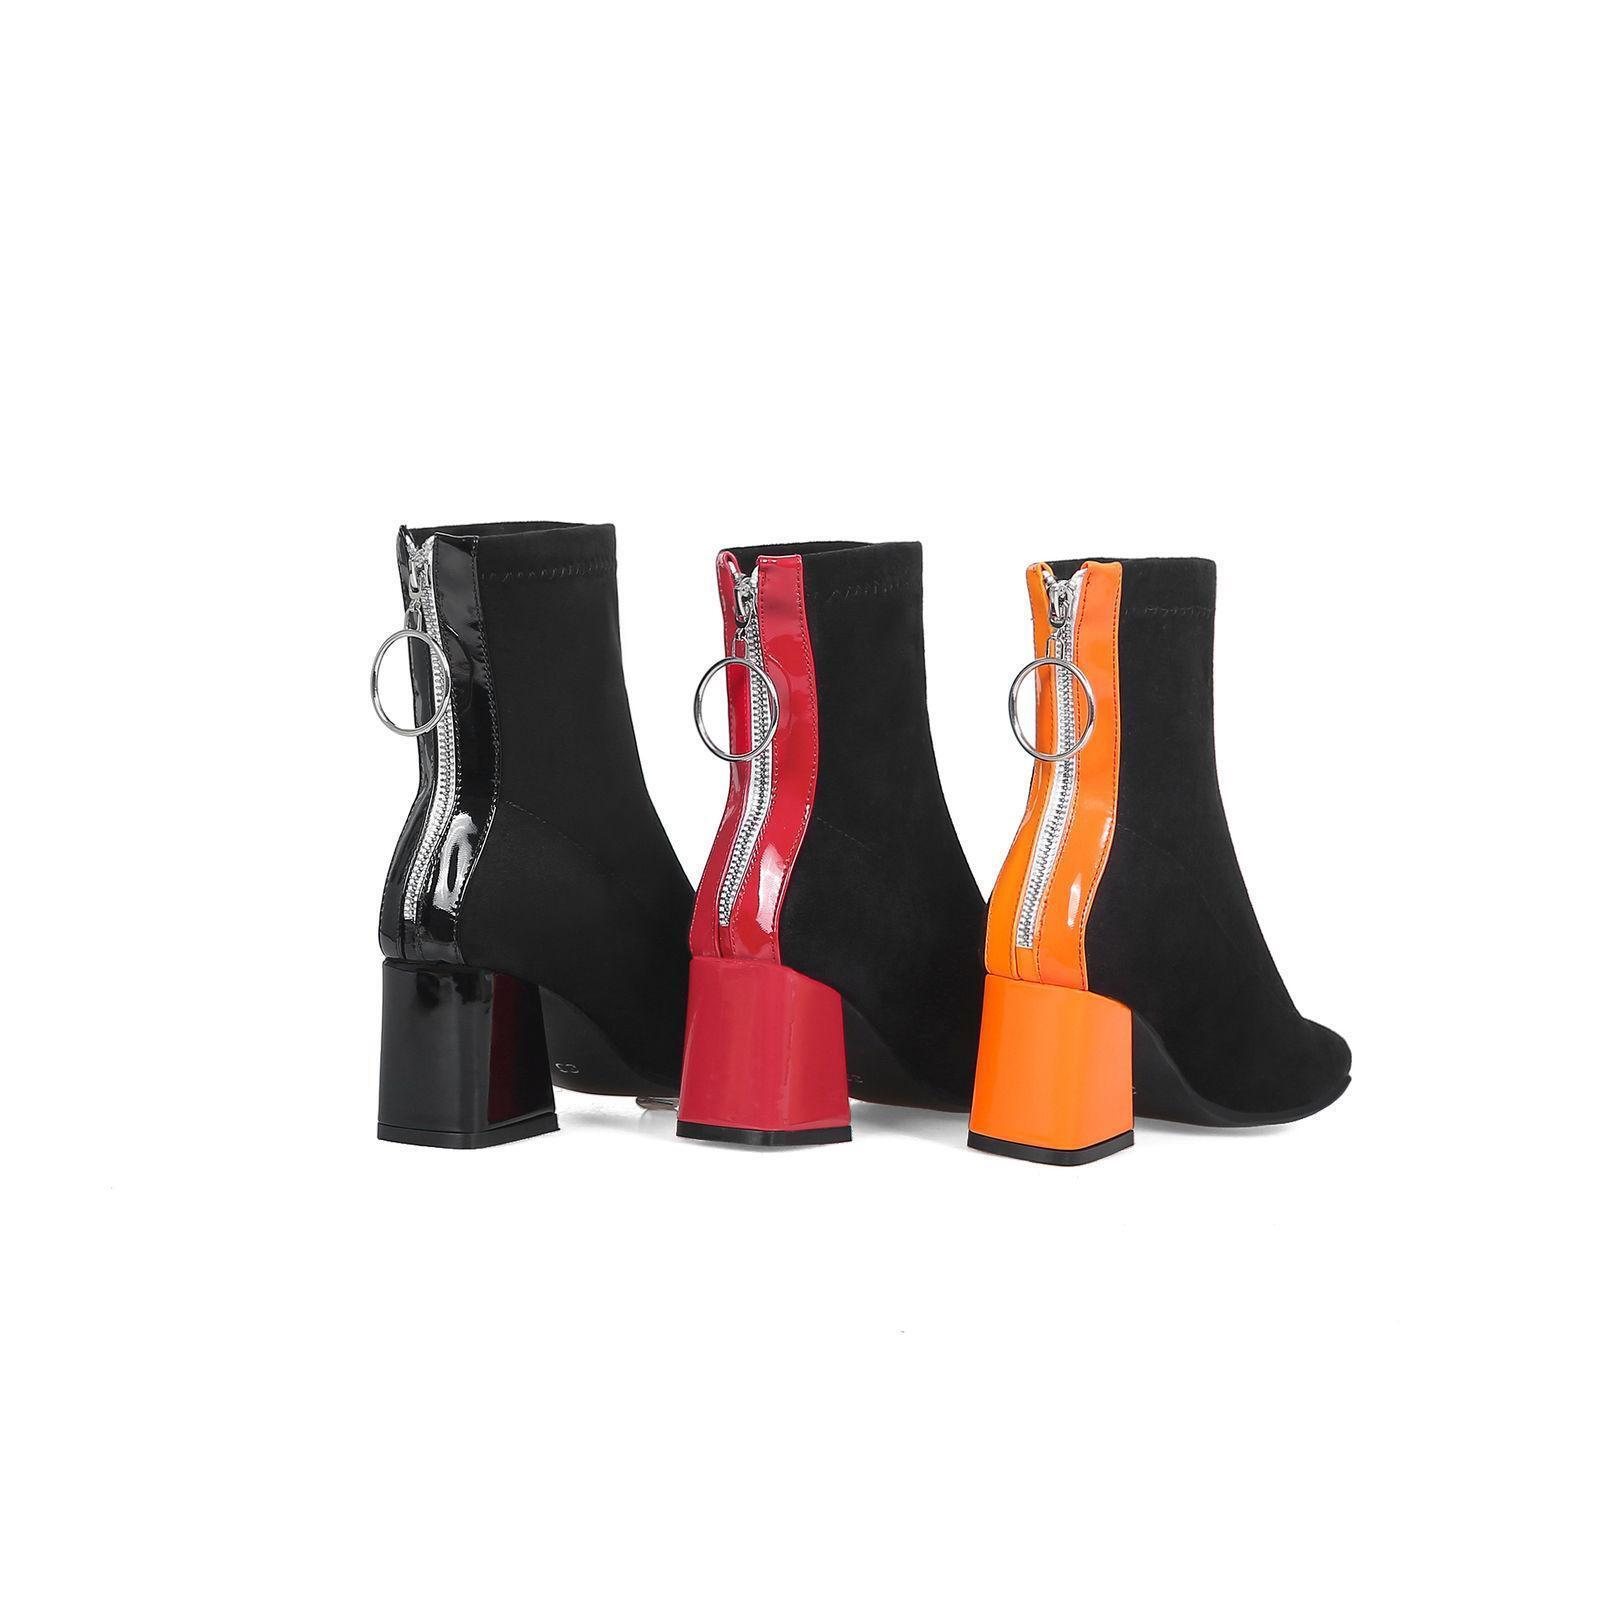 Black orange Red Block Heel shoes Ladies Suede Square Toe Back Zip Ankle Boots